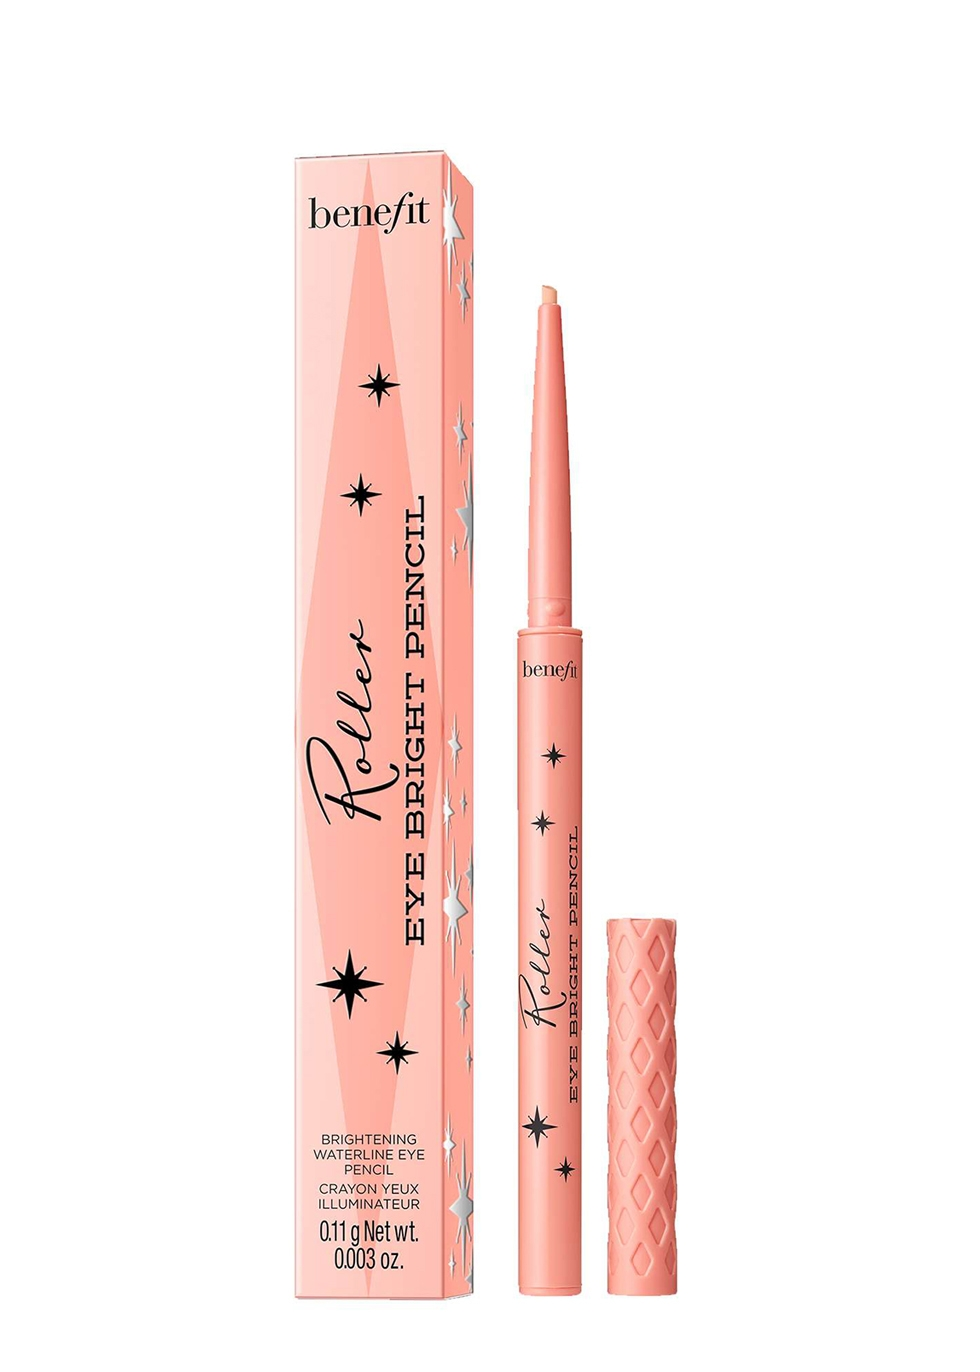 Roller Eye Bright Pencil - Benefit